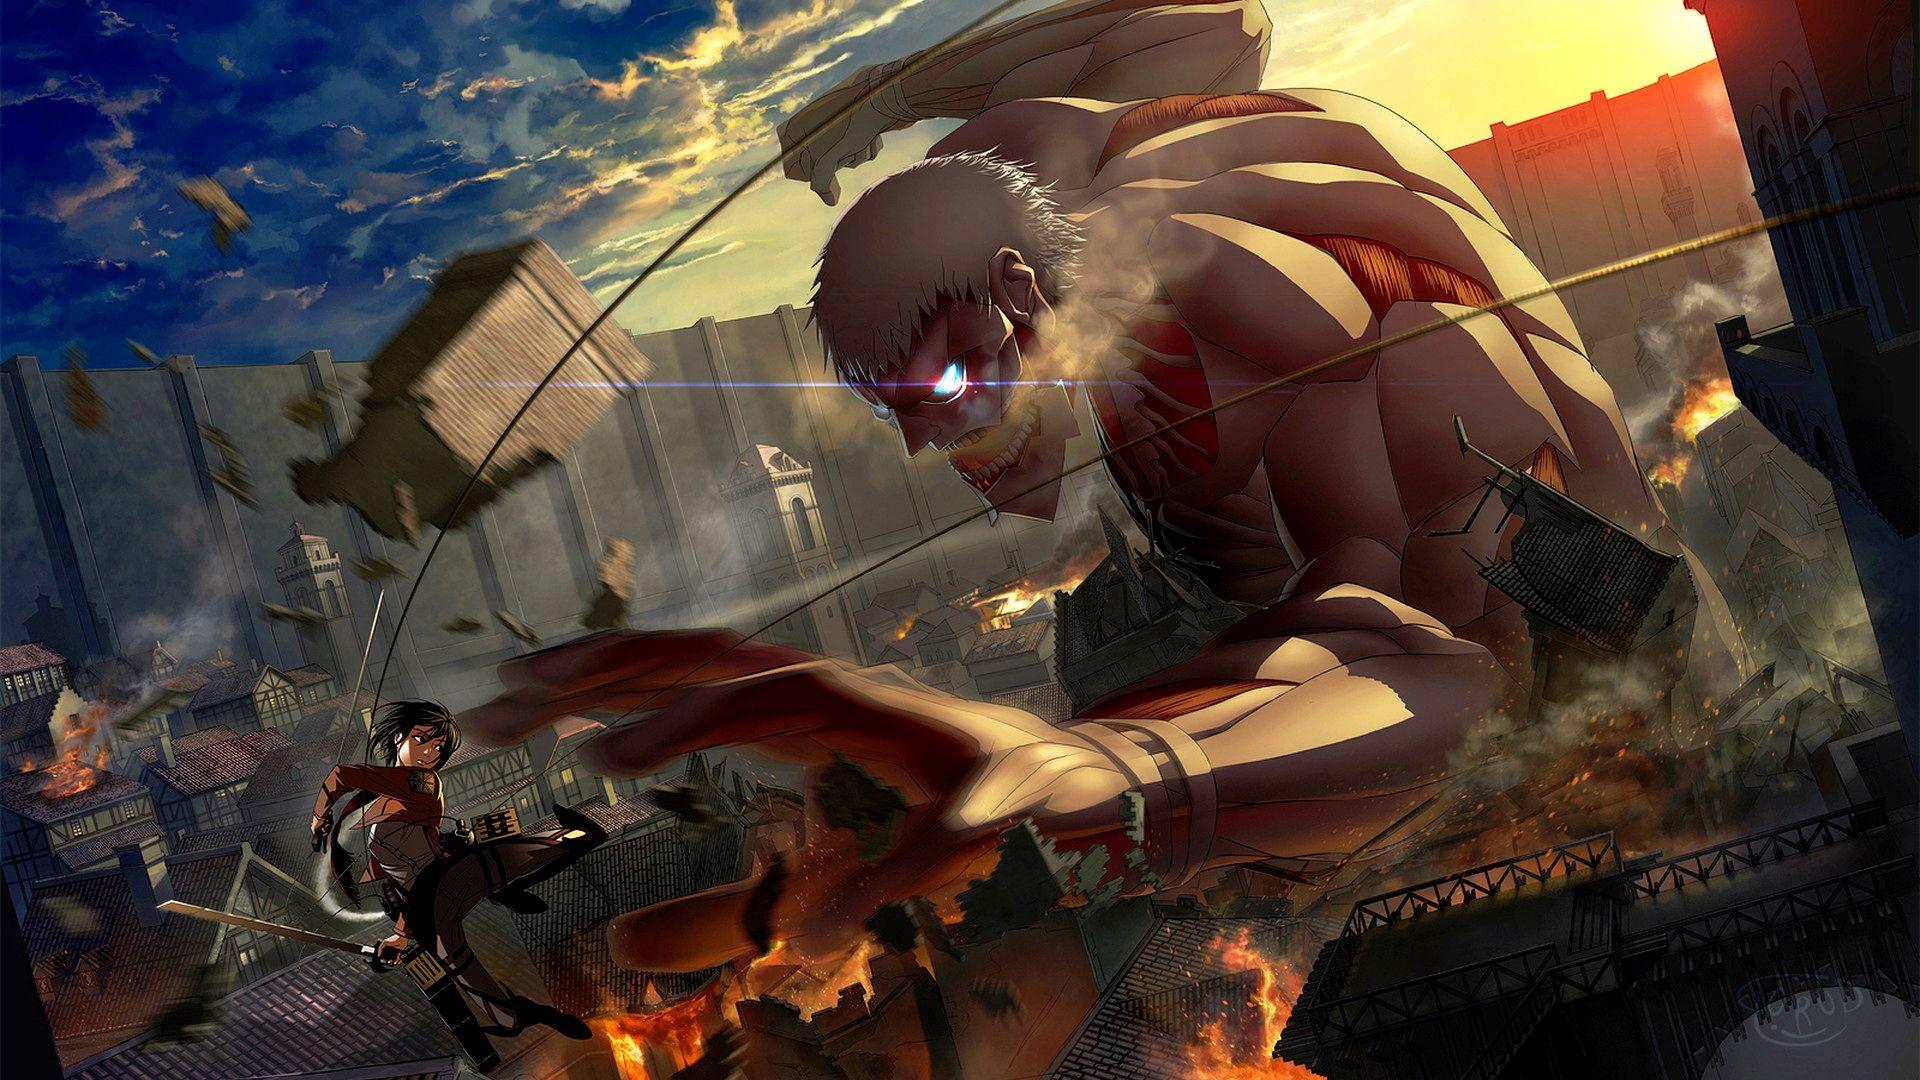 Anime Gaming Wallpaper 4k Ideas Di 2020 Seni Anime Animasi Attack On Titan